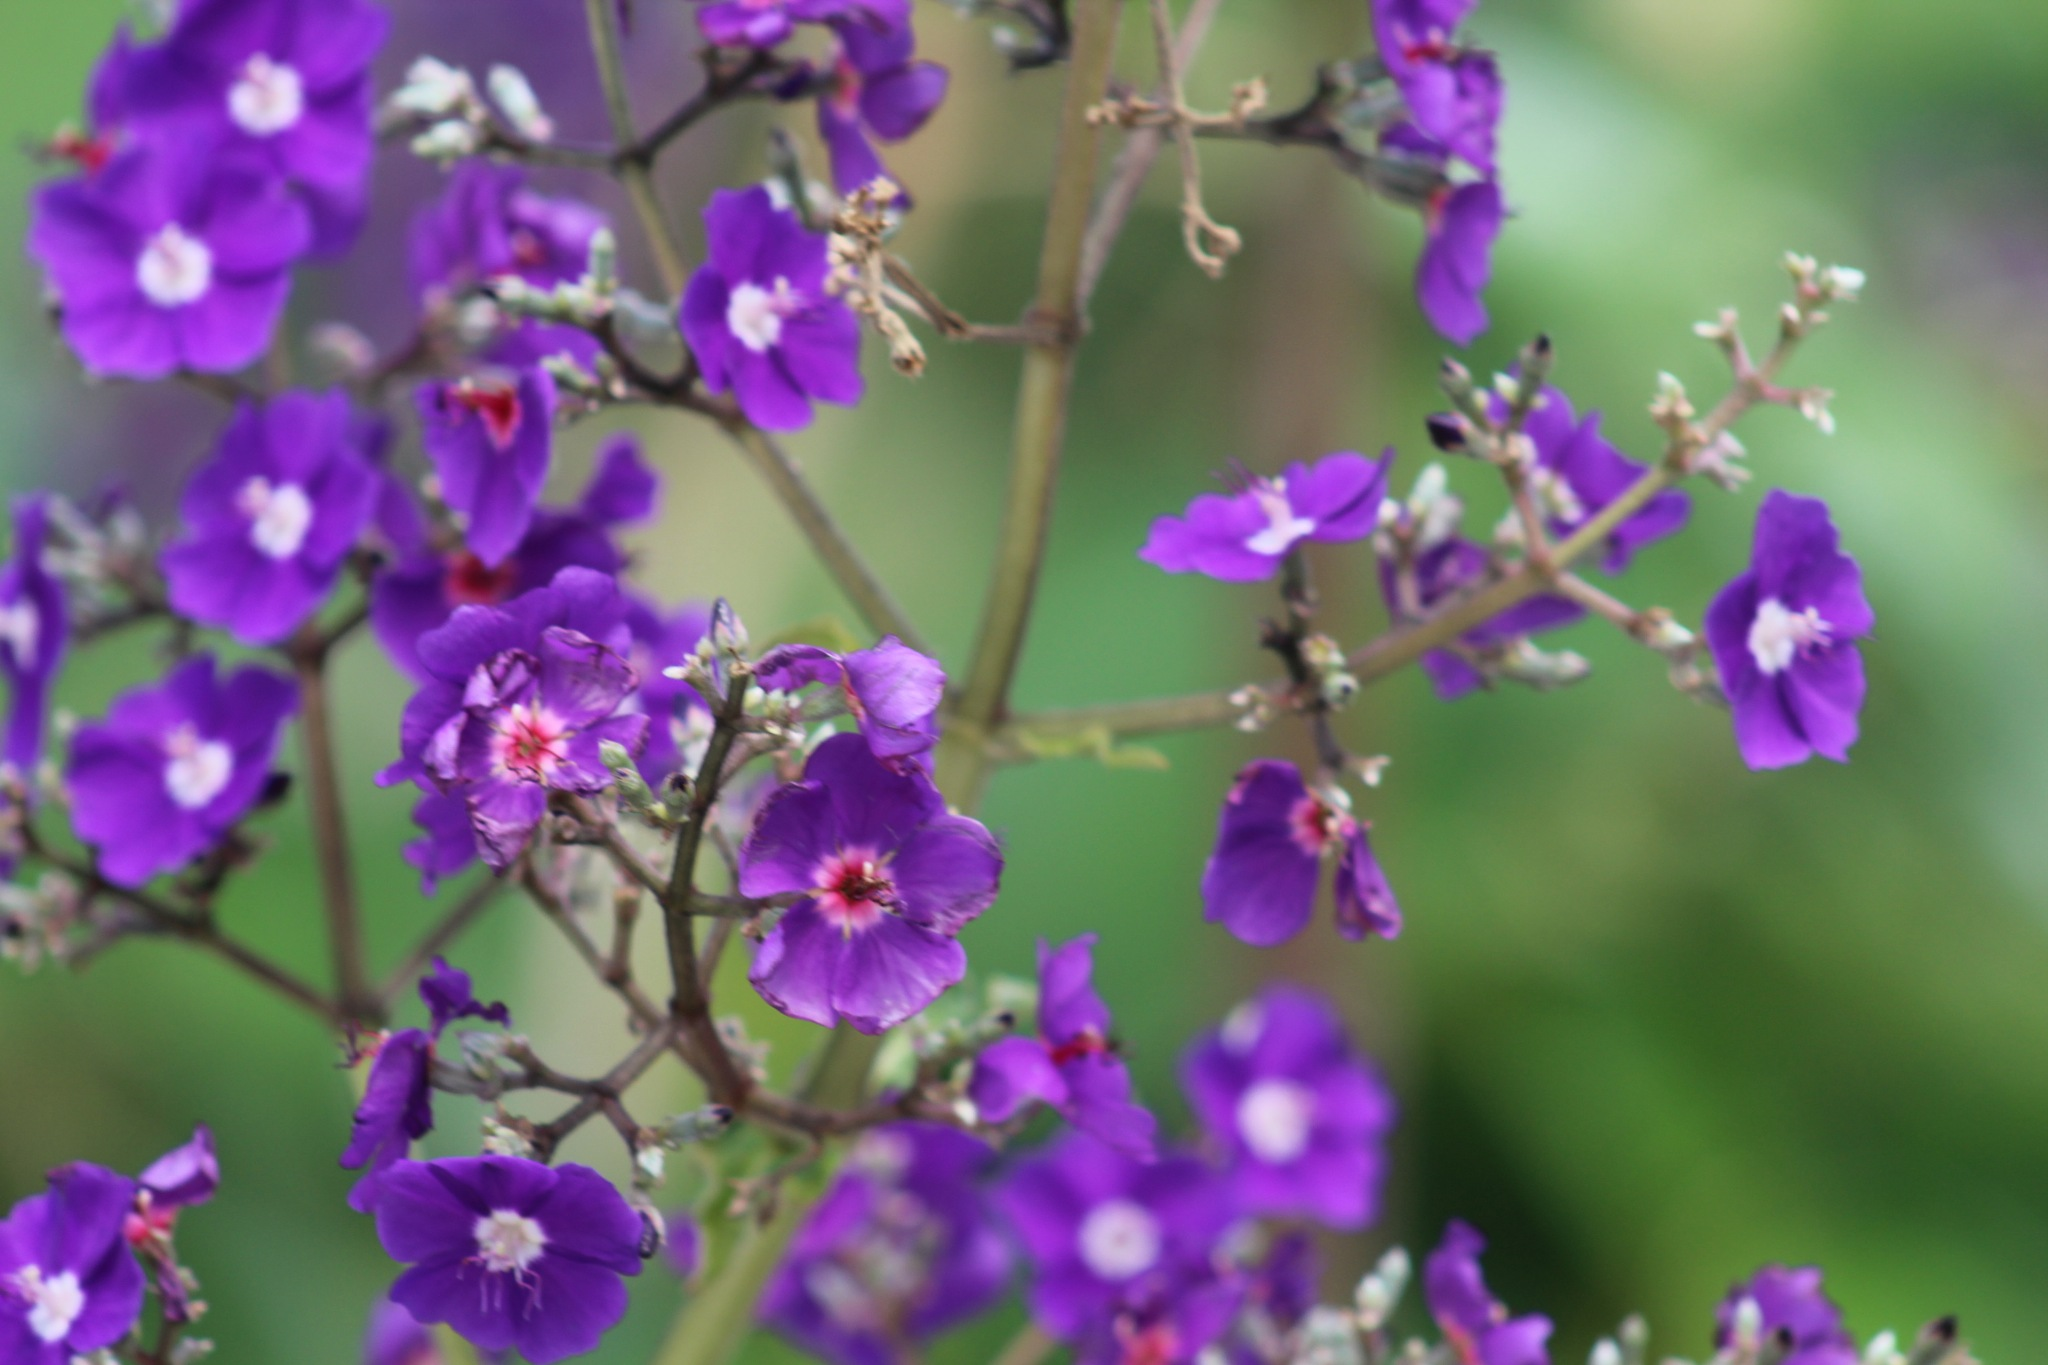 purple petals by Diane.Mumbower